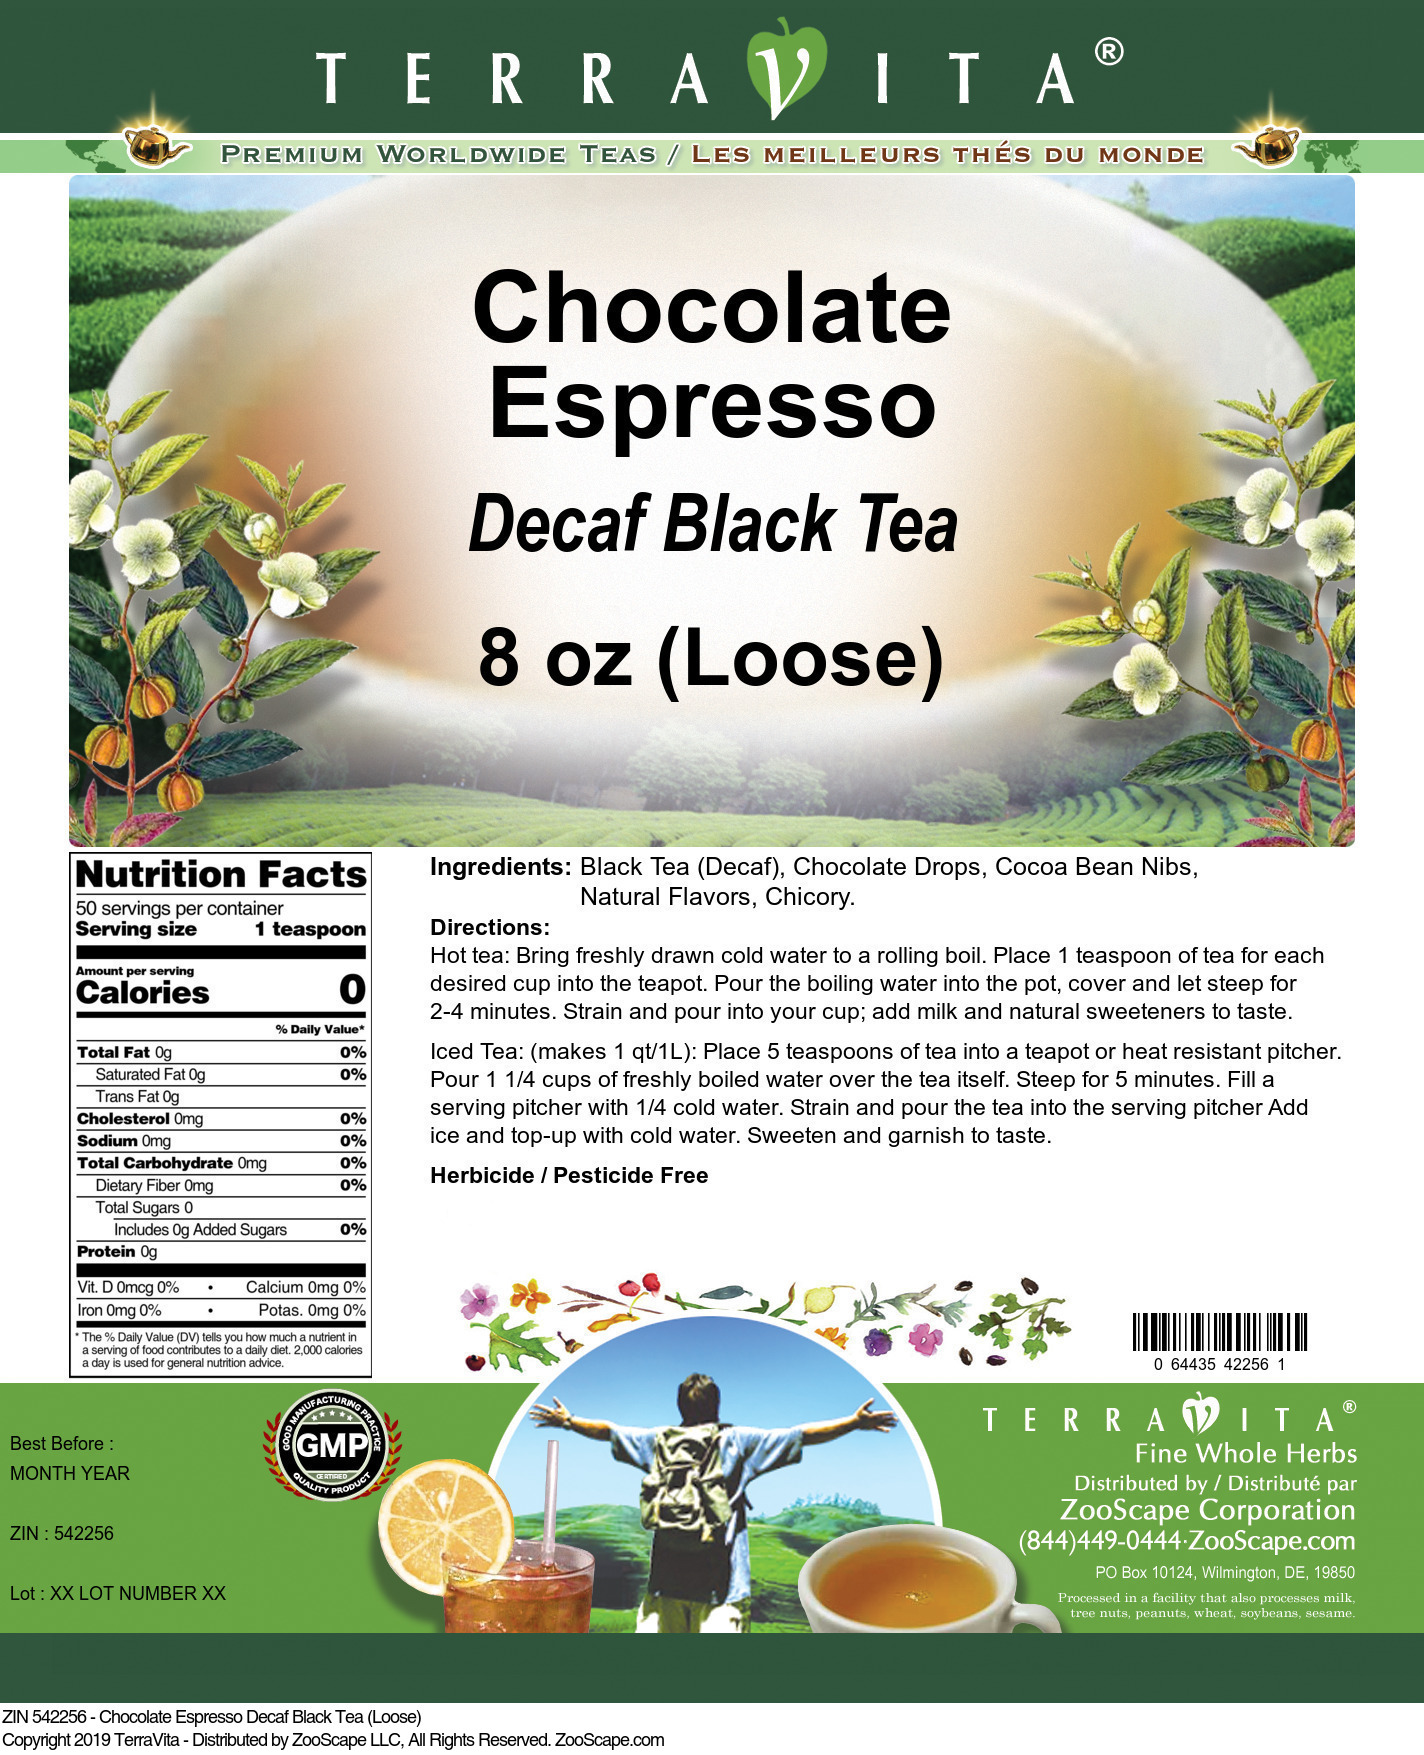 Chocolate Espresso Decaf Black Tea